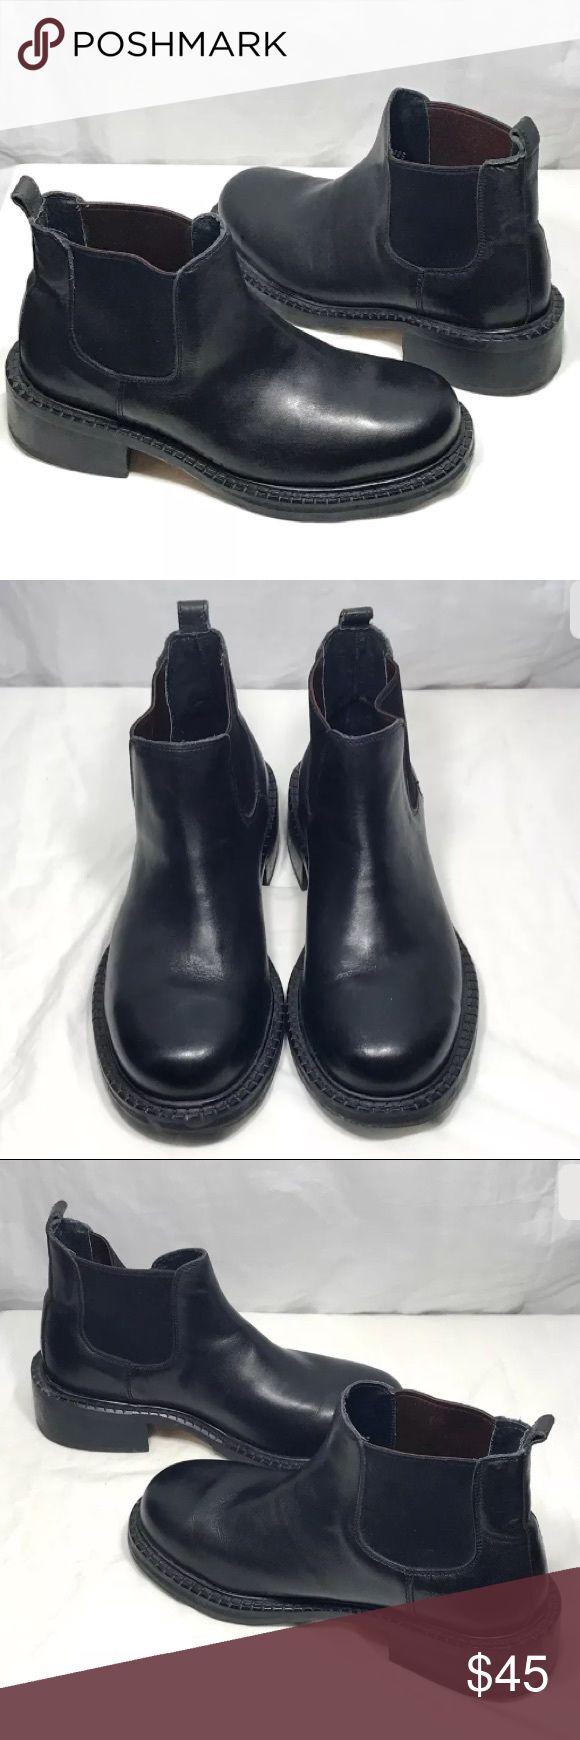 Capa De Ozono Black Leather Chelsea Ankle Boots 6 Capa De Ozono Black Leather Chelsea Ankle Dress Boots Shoes 6 Cape De Ozono Shoes Boots